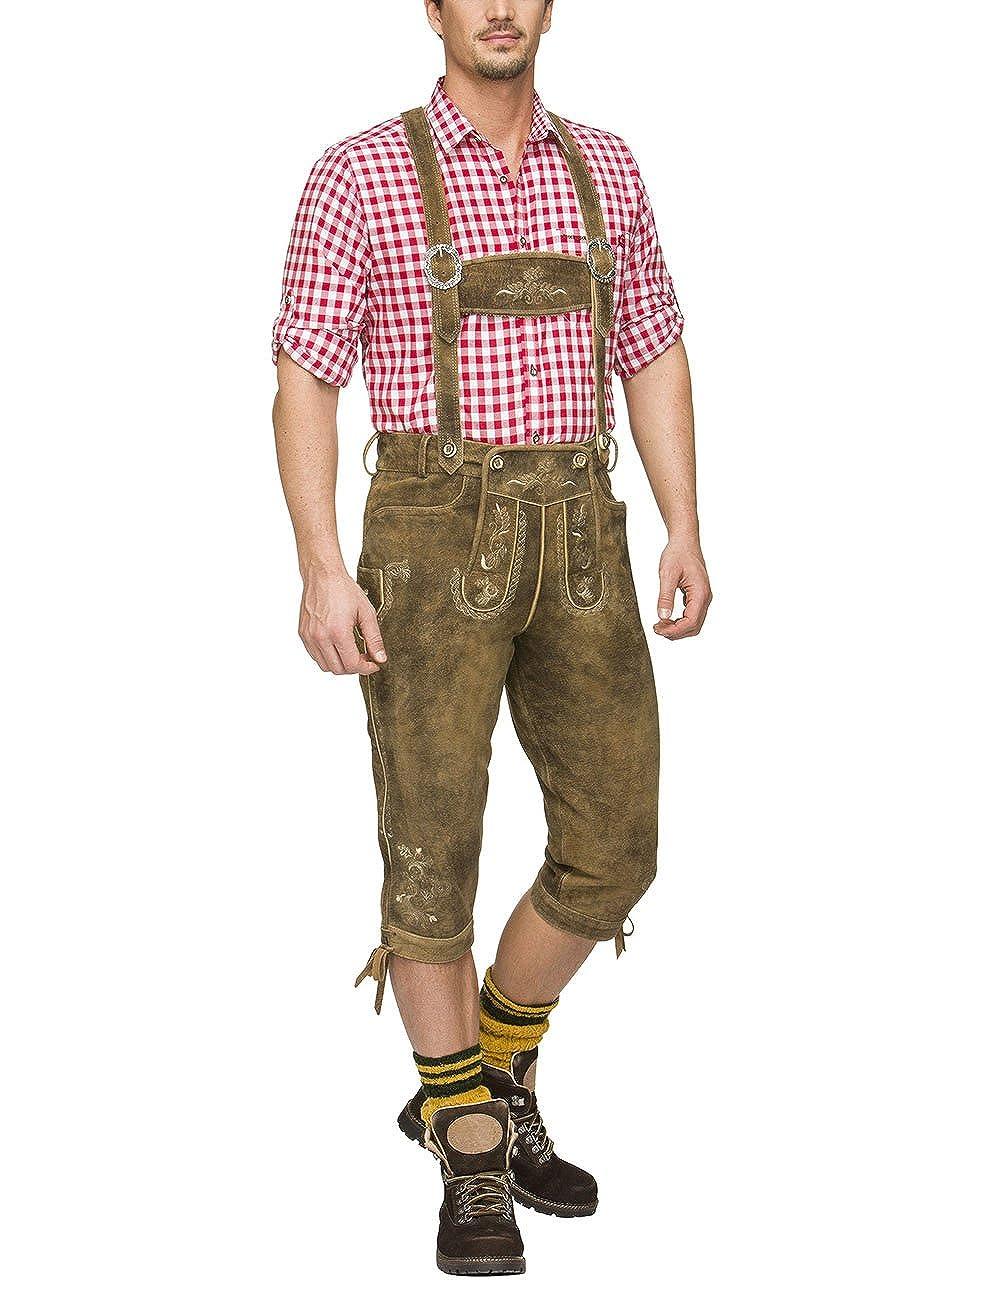 Stockerpoint Herren Herren Herren Lederhose B01IEJSQLI Lederhosen Verbraucher zuerst 449d8b